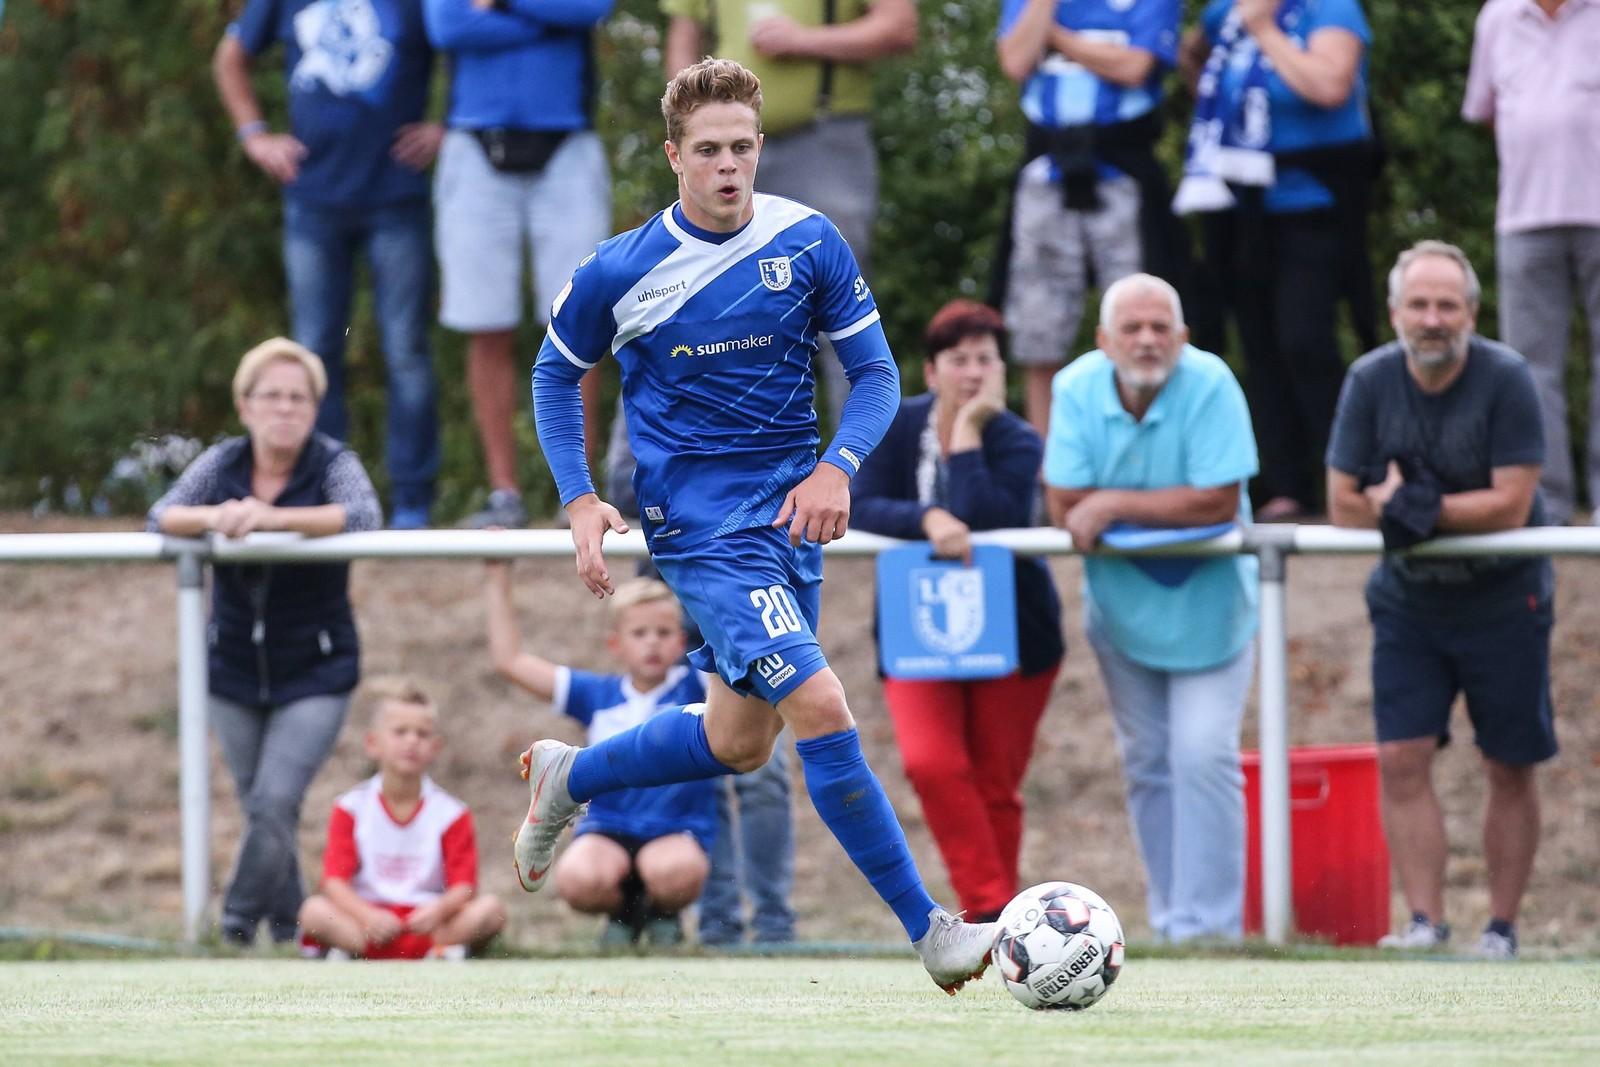 Joel Abu Hanna im Trikot des 1. FC Magdeburg